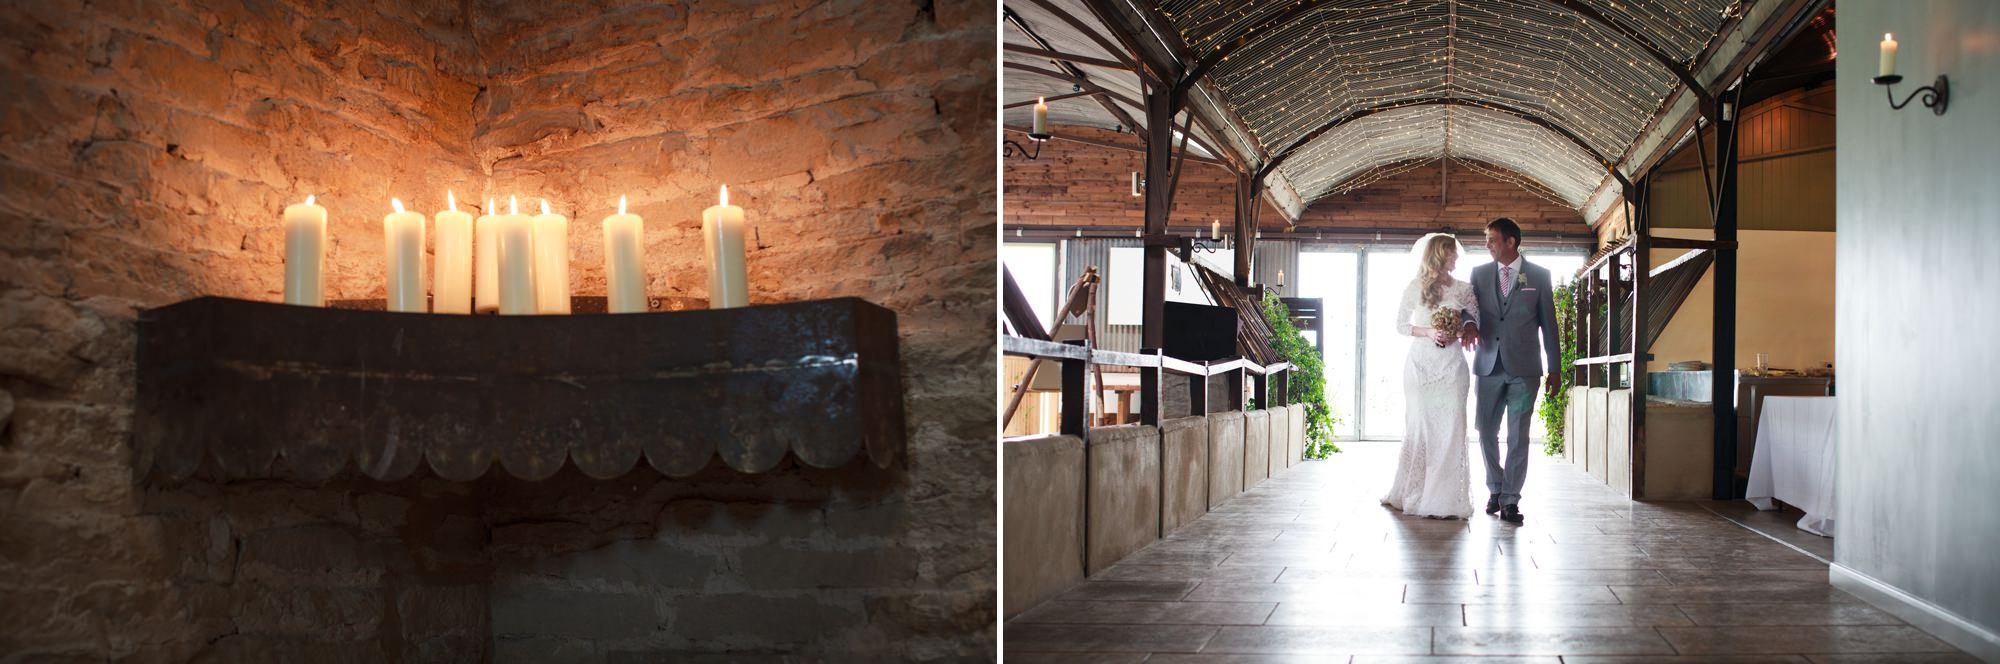 stone-barn-wedding-2